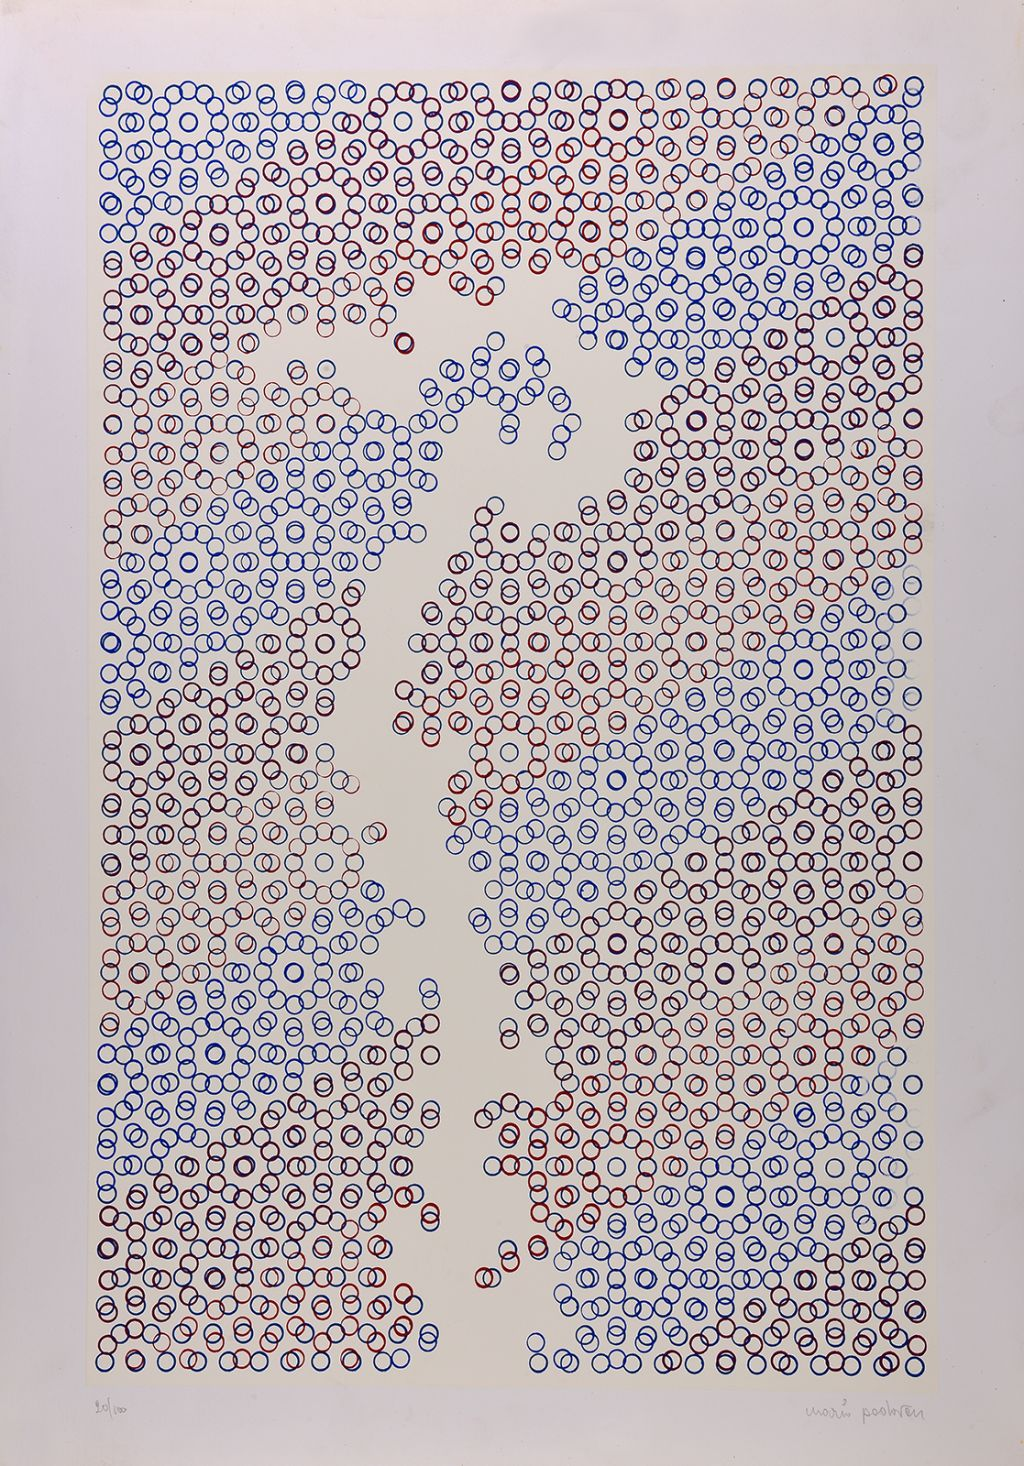 padovan-mario-litografia